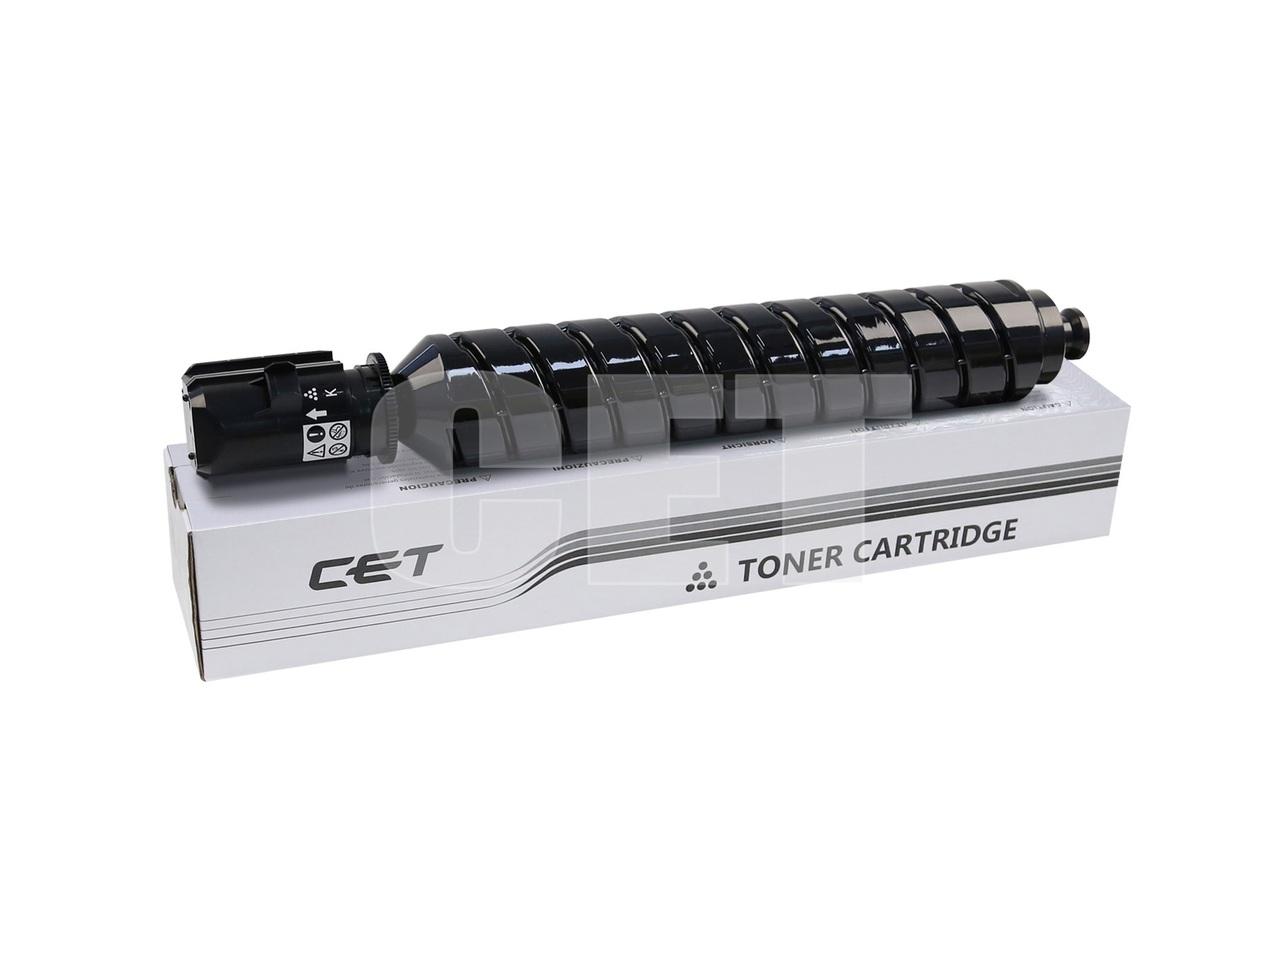 Тонер-картридж (TF8) C-EXV54 для CANON iRC3025/iRC3025i(CET) Black, (EUR/MEA/Afr), 342г, 15500 стр., CET141358